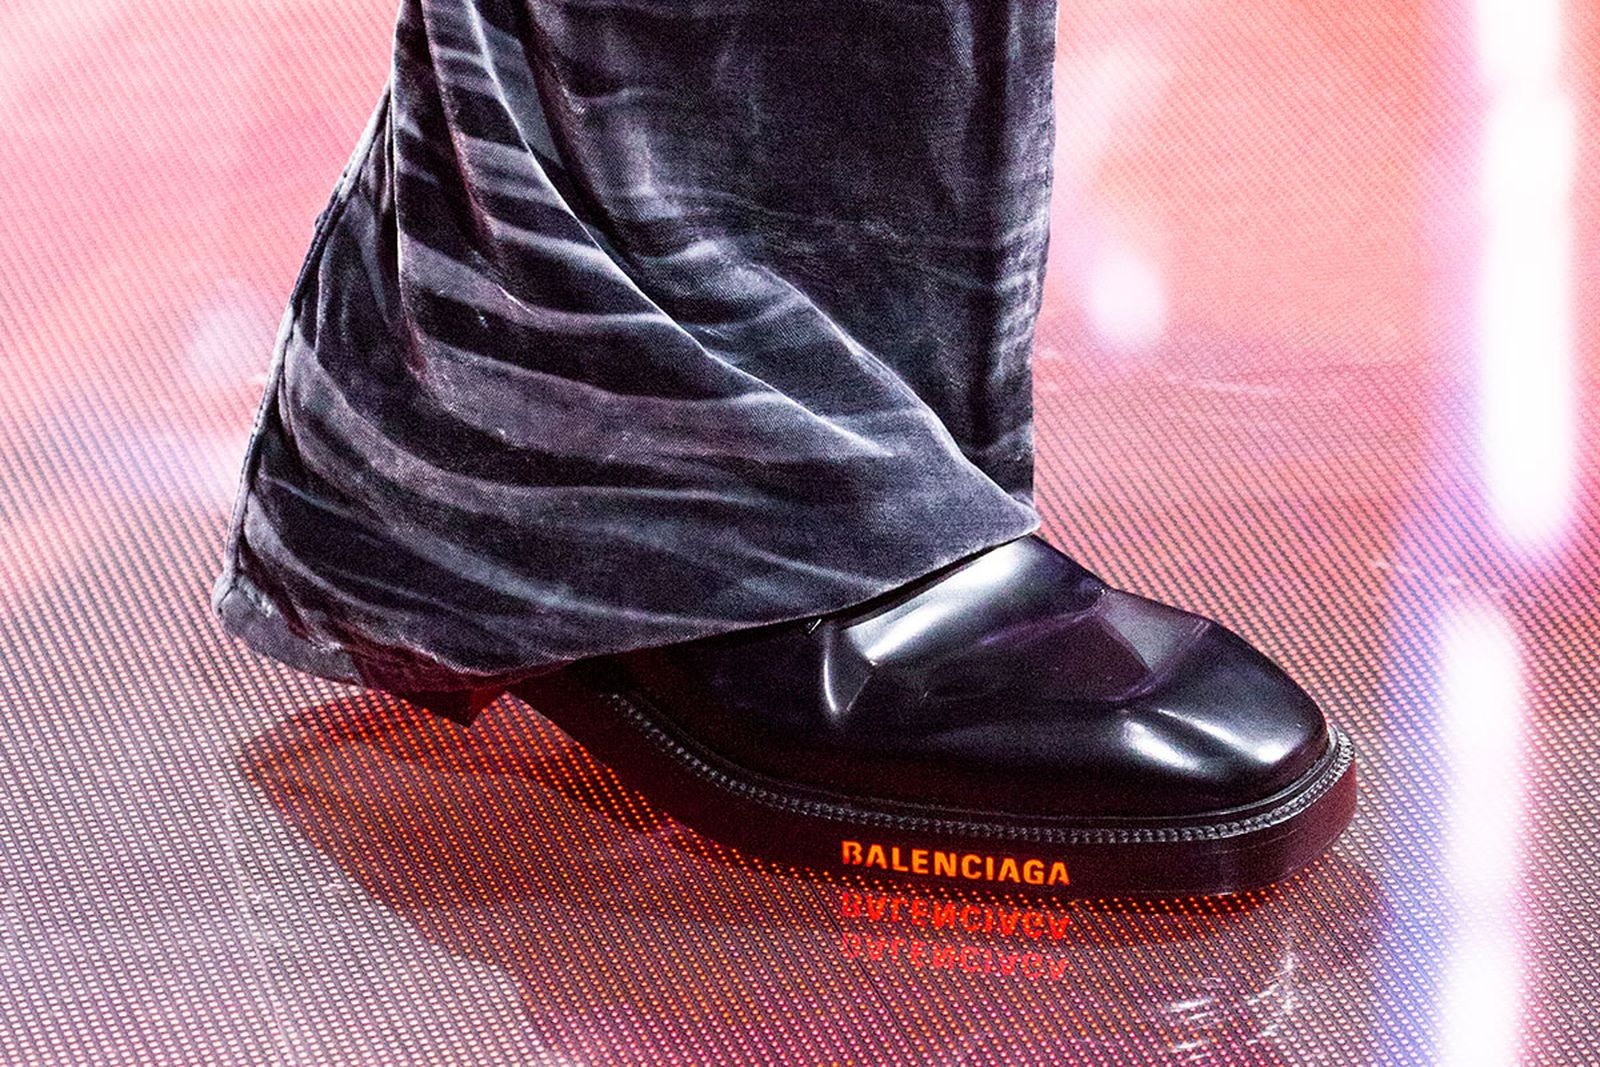 ss19 fashion week no sneakers main 2 Balenciaga Gucci Maison Margiela